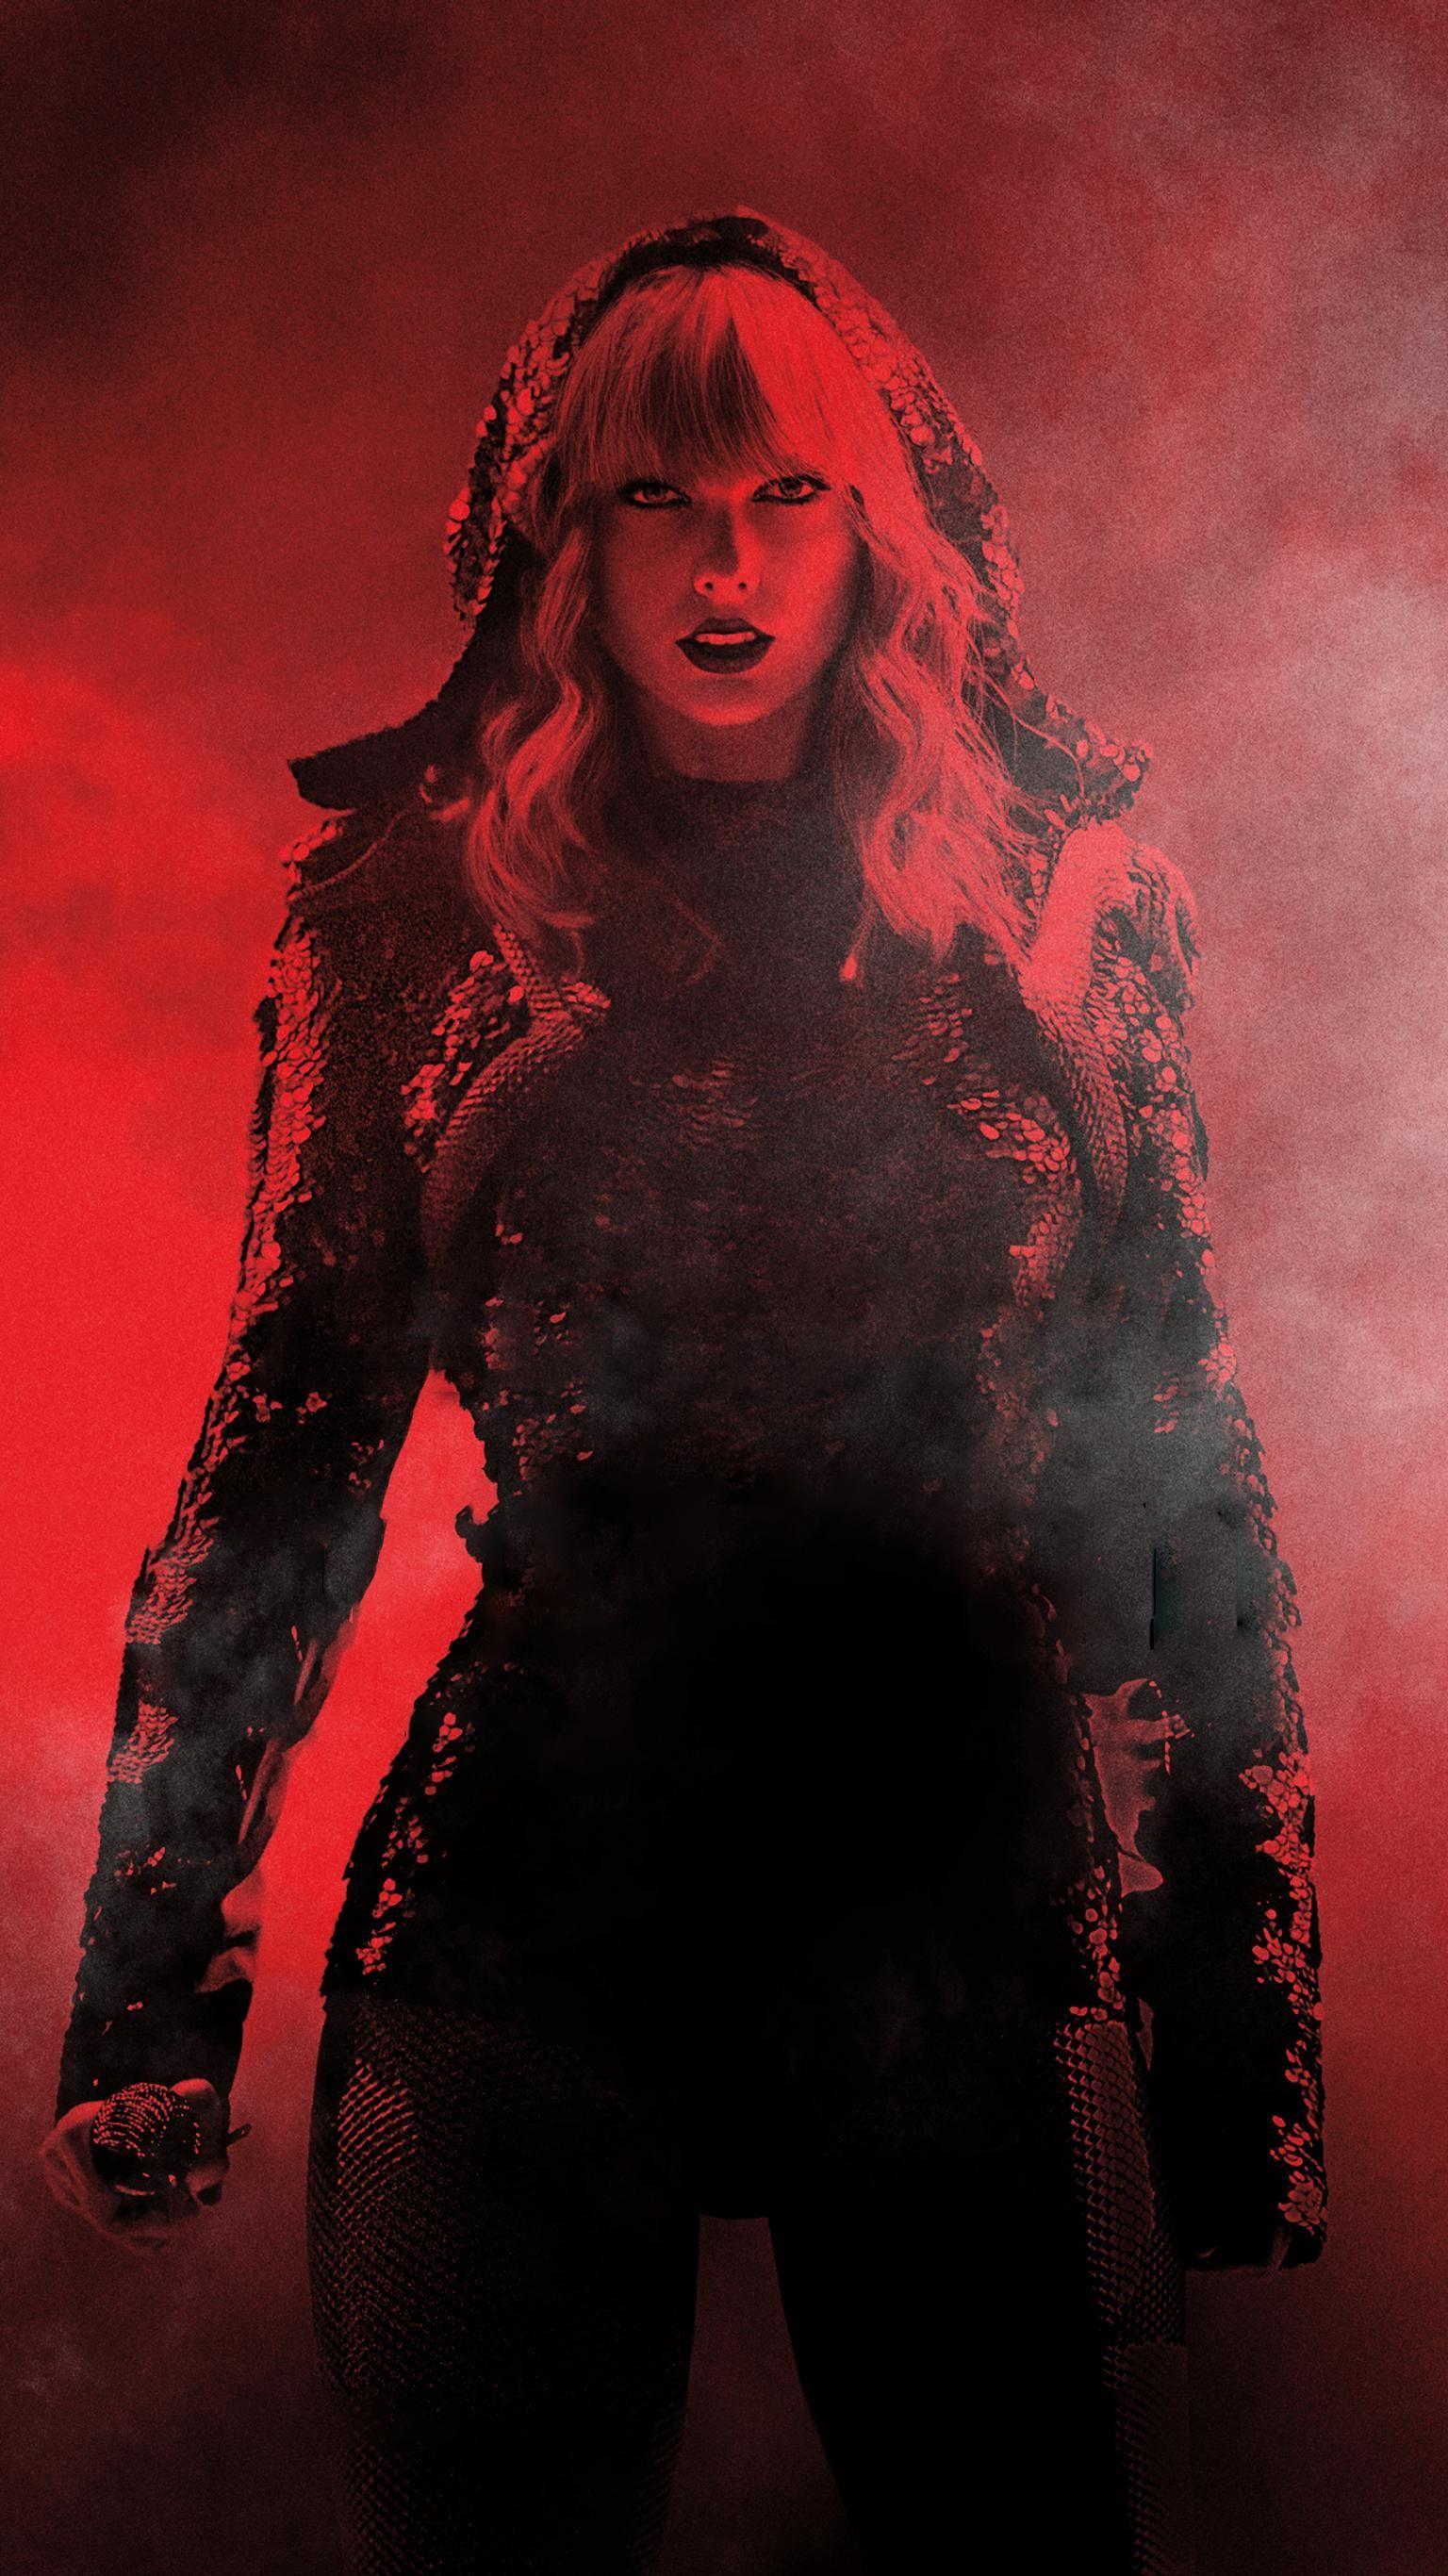 Paul Dugdale Phone Wallpapers Moviemania Fifty In 2020 Taylor Swift Pictures Taylor Swift Taylor Swift Hair